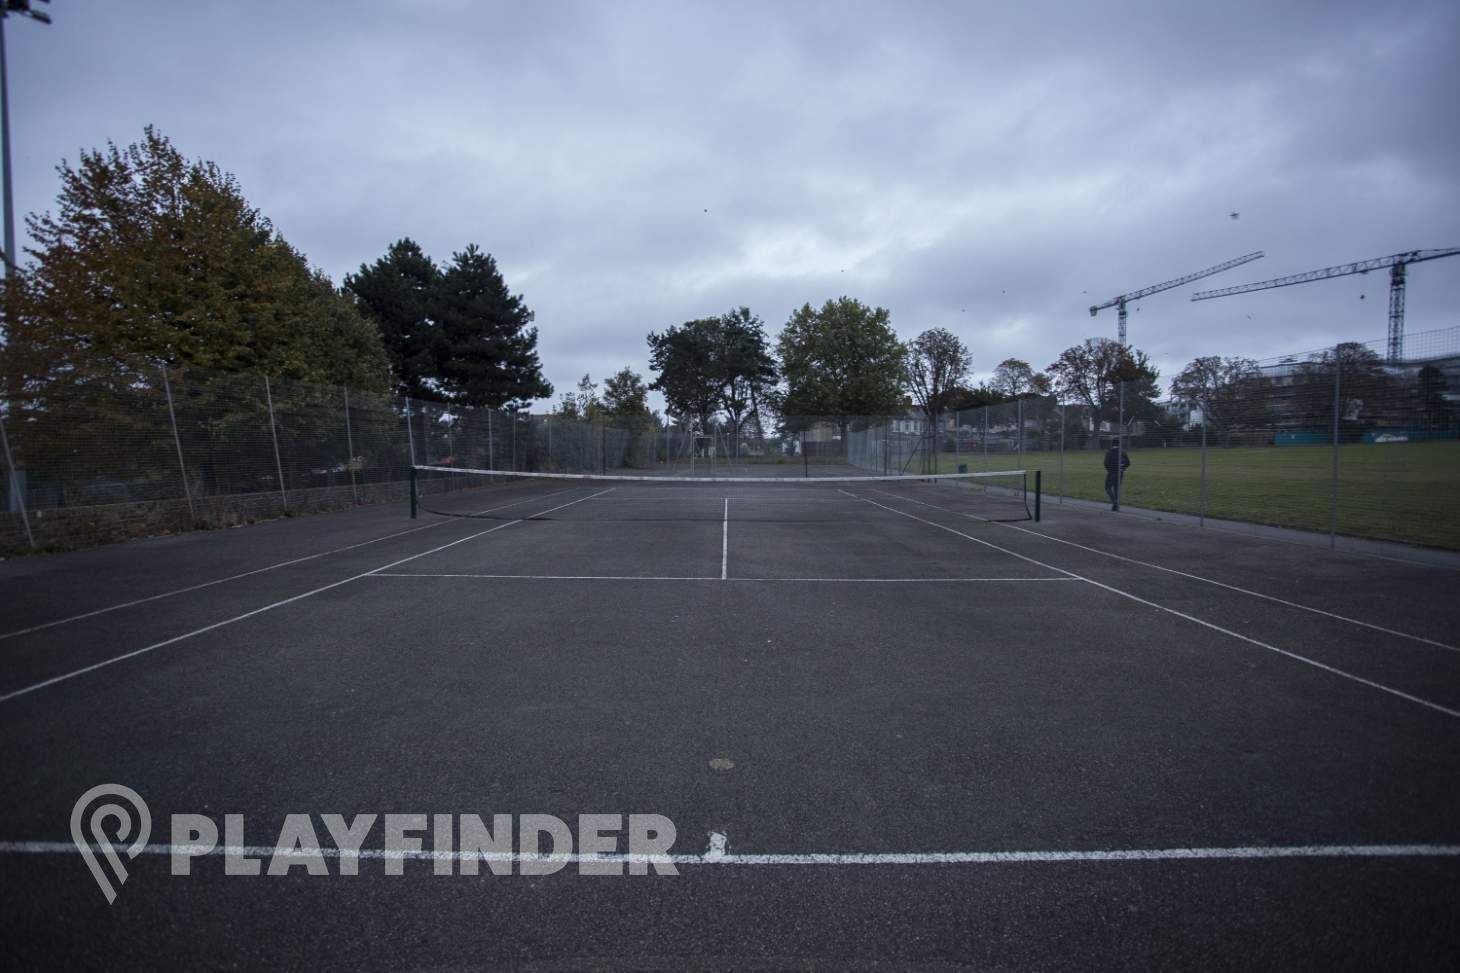 Erith Leisure Centre Outdoor | Hard (macadam) tennis court